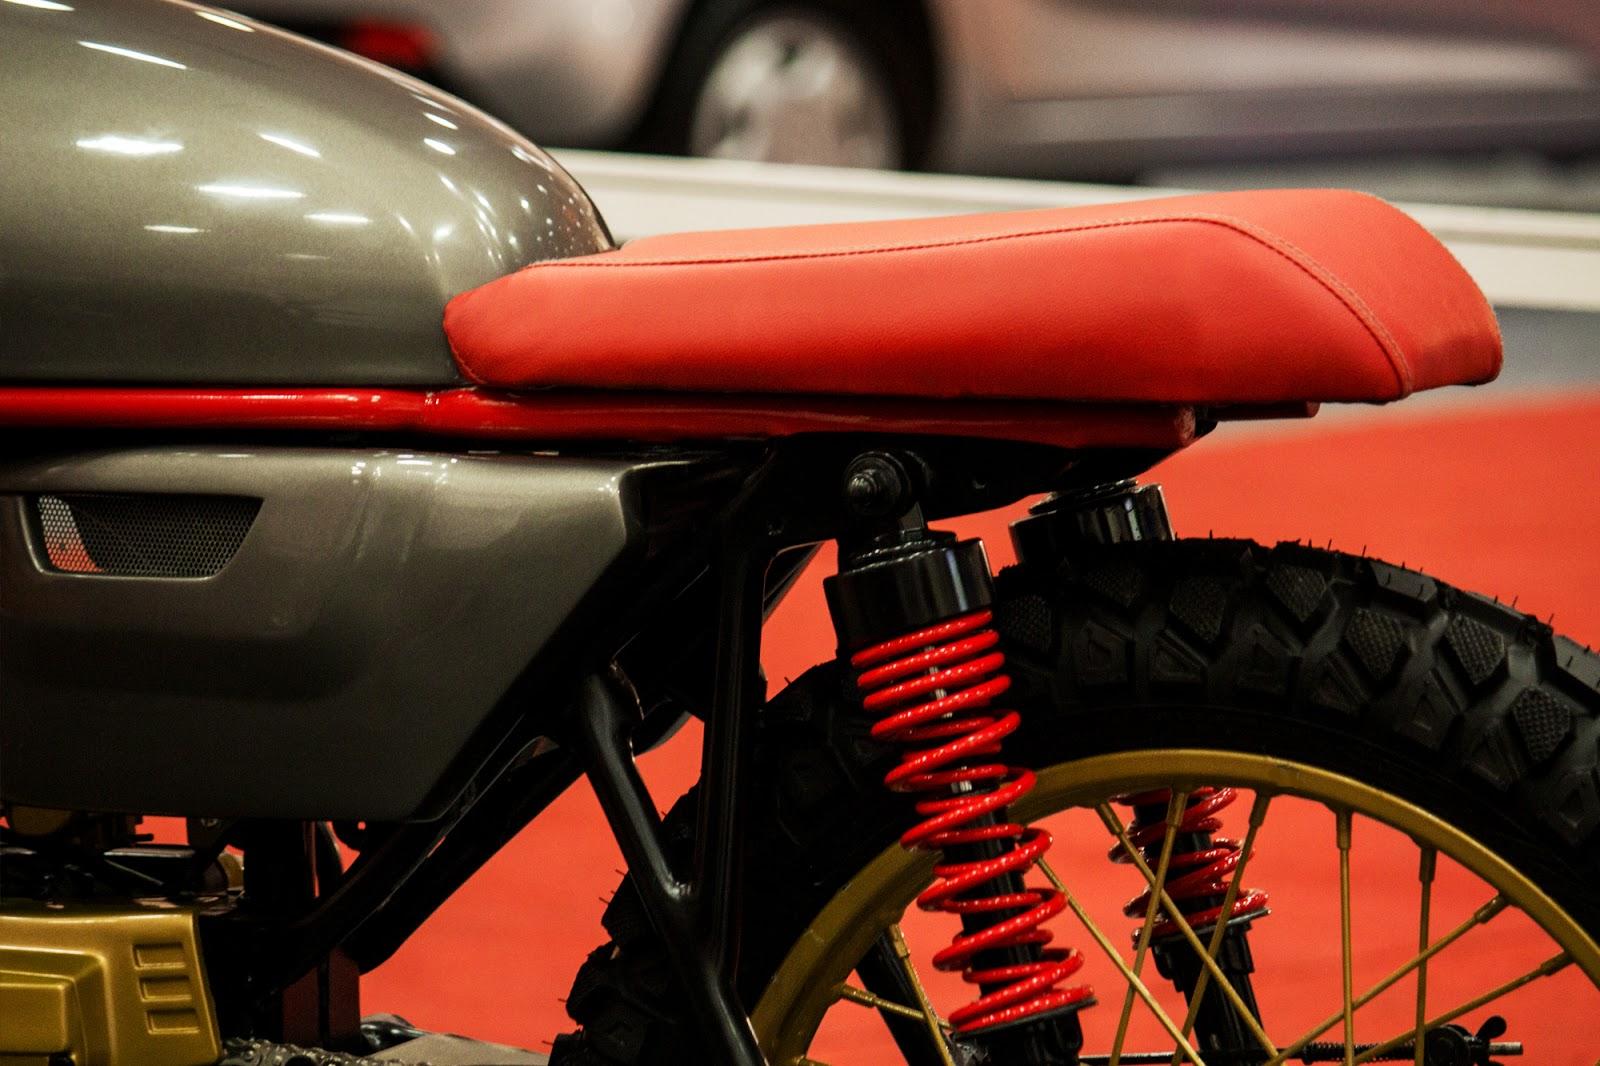 Yamaha Rx100 Cafe Racer Parts   Reviewmotors co